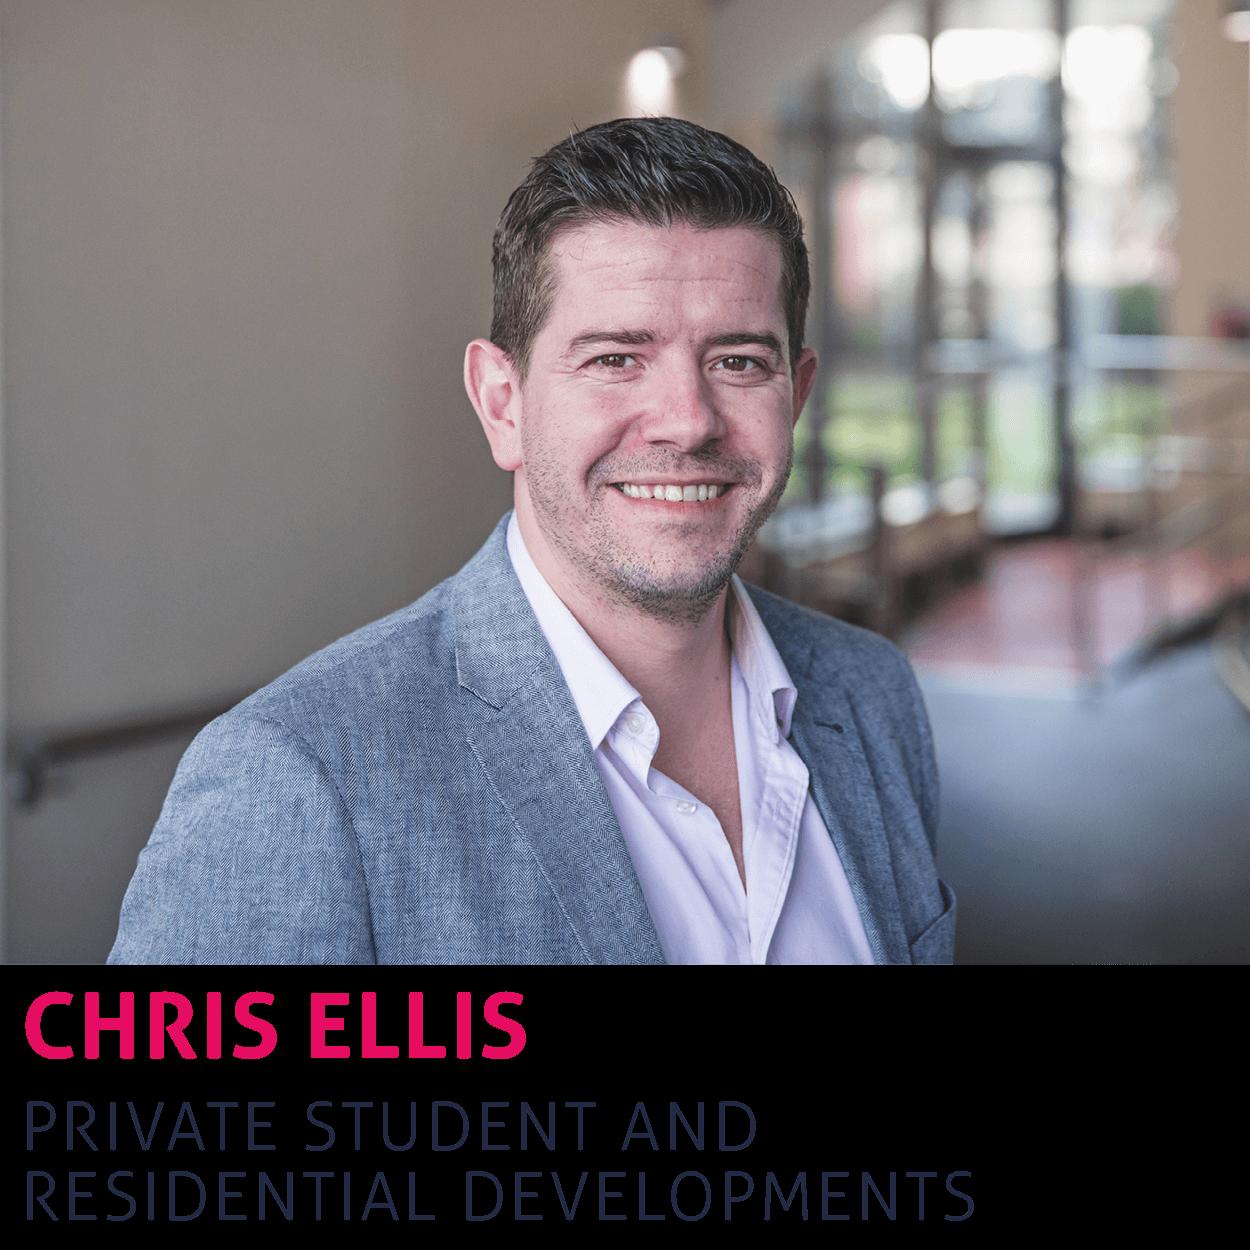 Link to Chris Ellis's contact details.